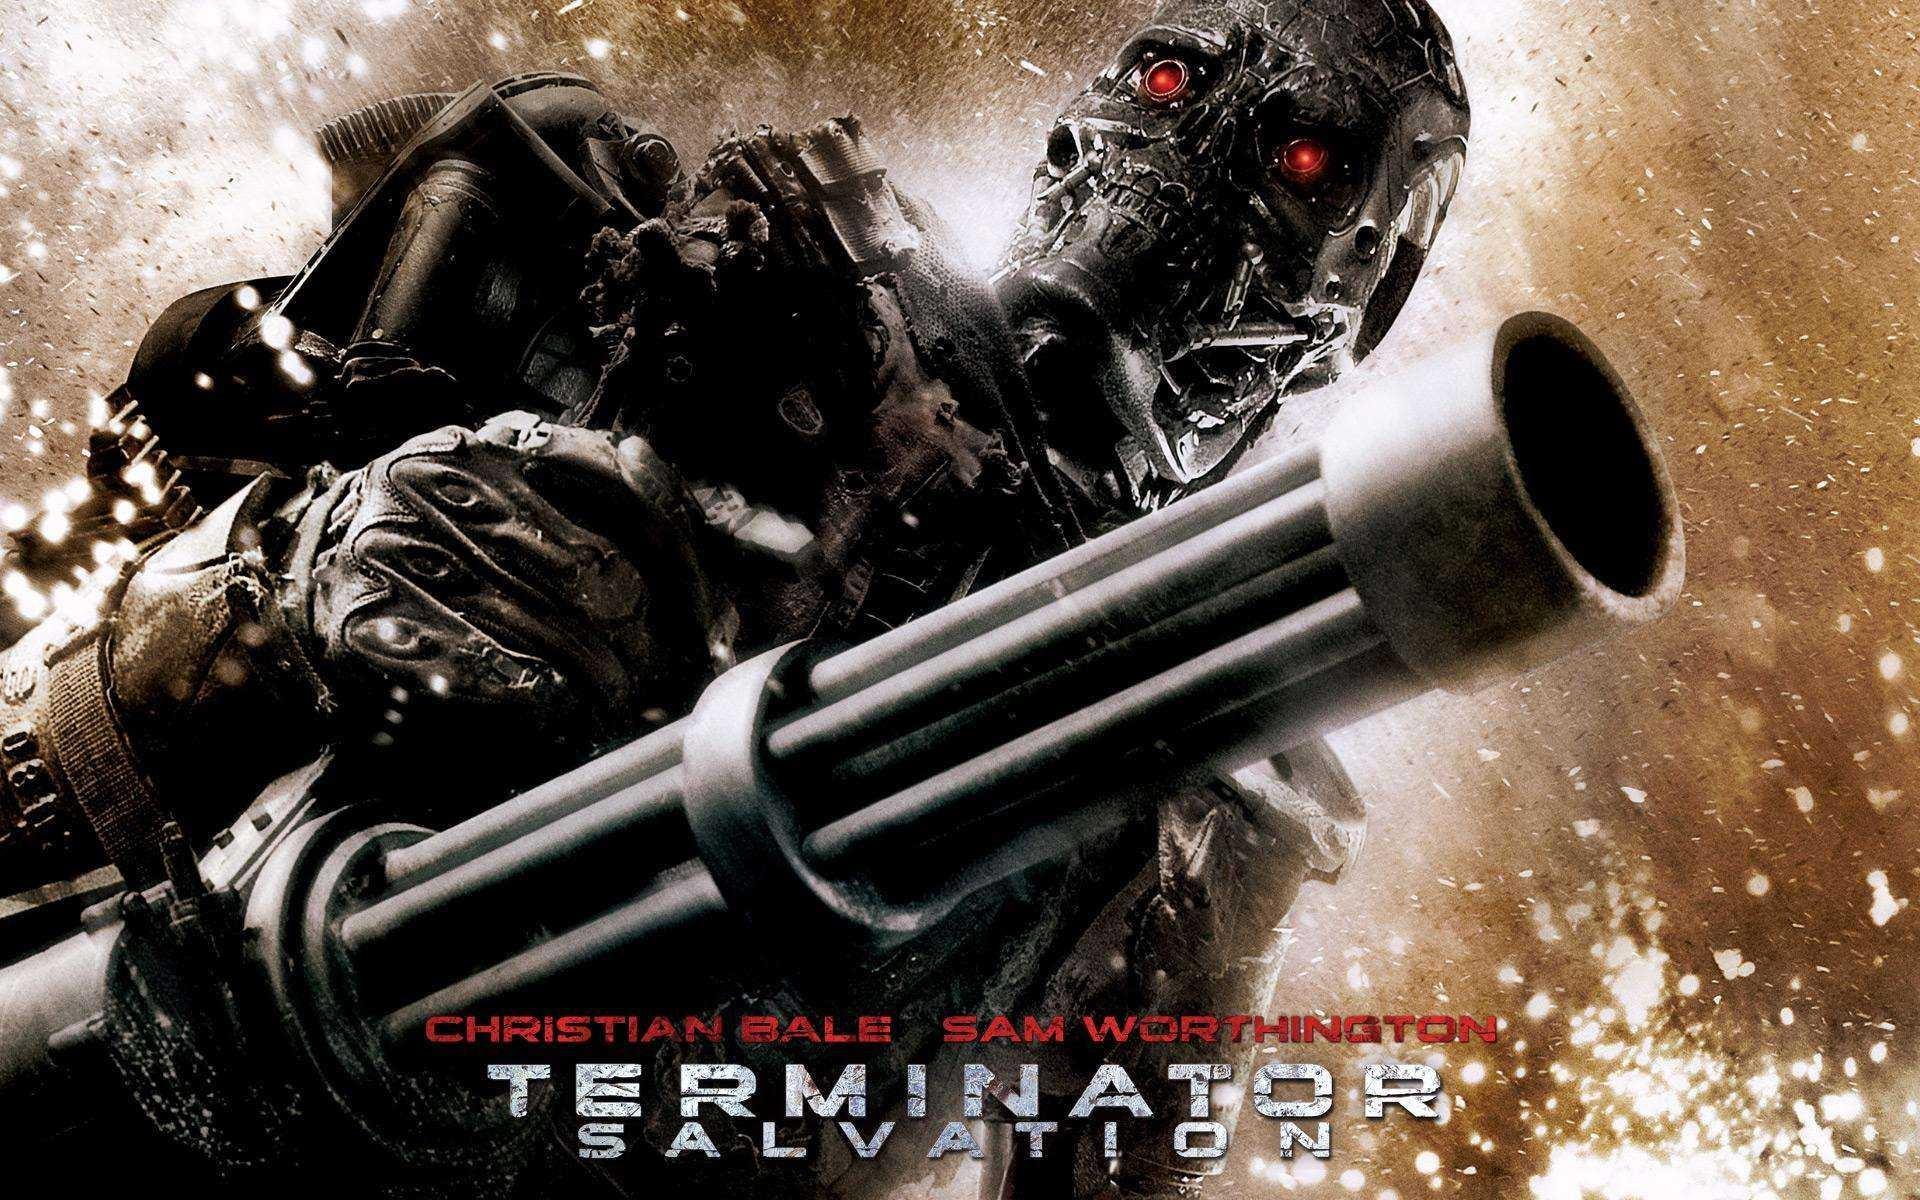 Wallpaper del film Terminator Salvation